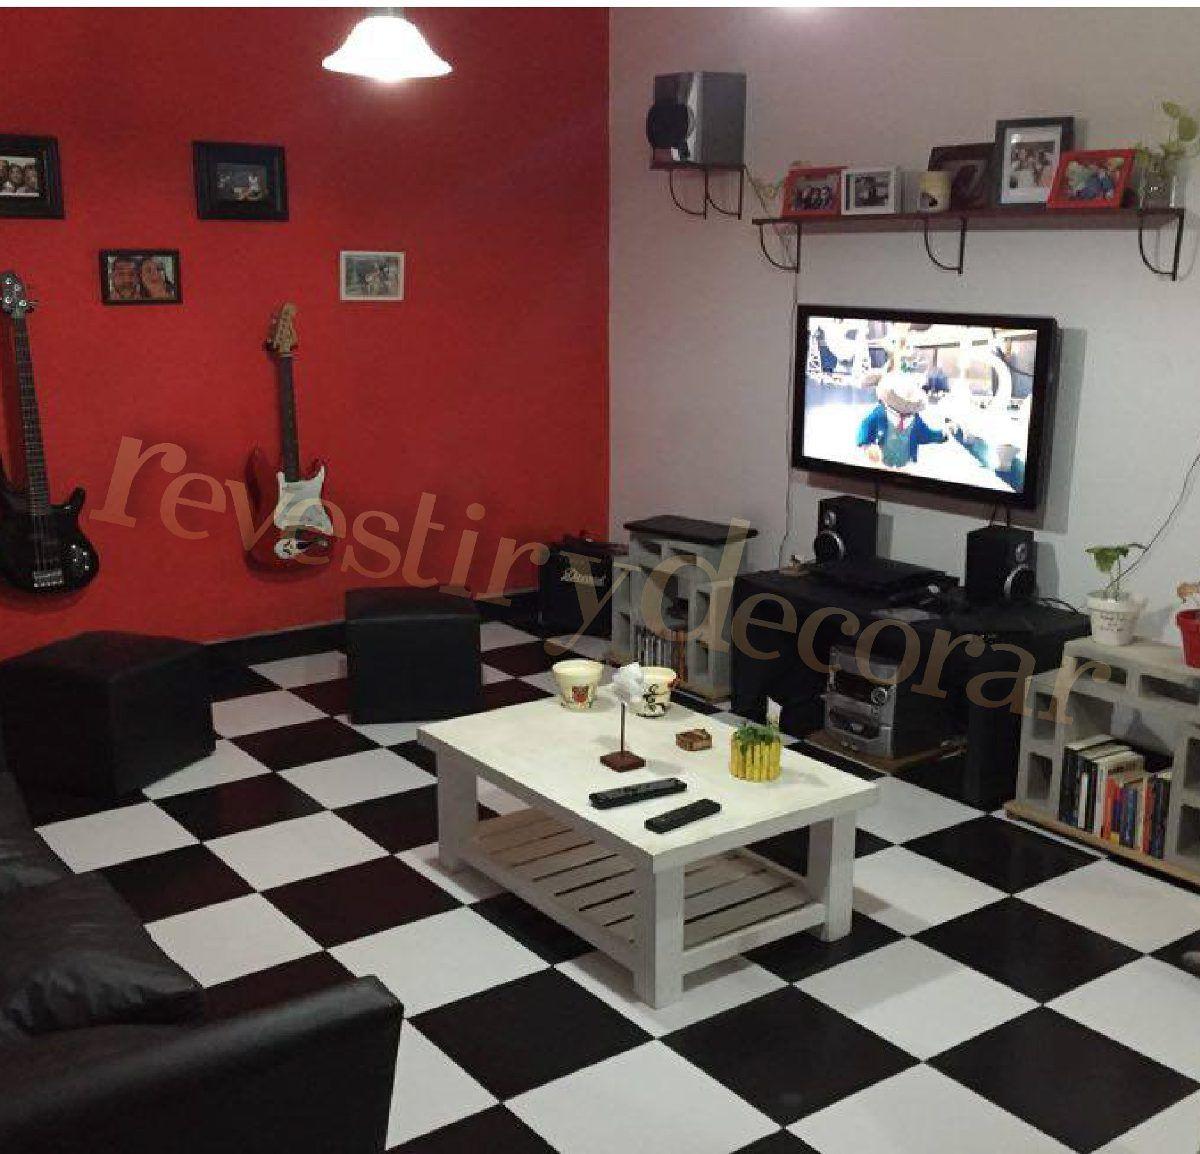 Ceramica piso blanco negro 35x35 primera calidad oferta for Modelos de ceramica para pisos de sala